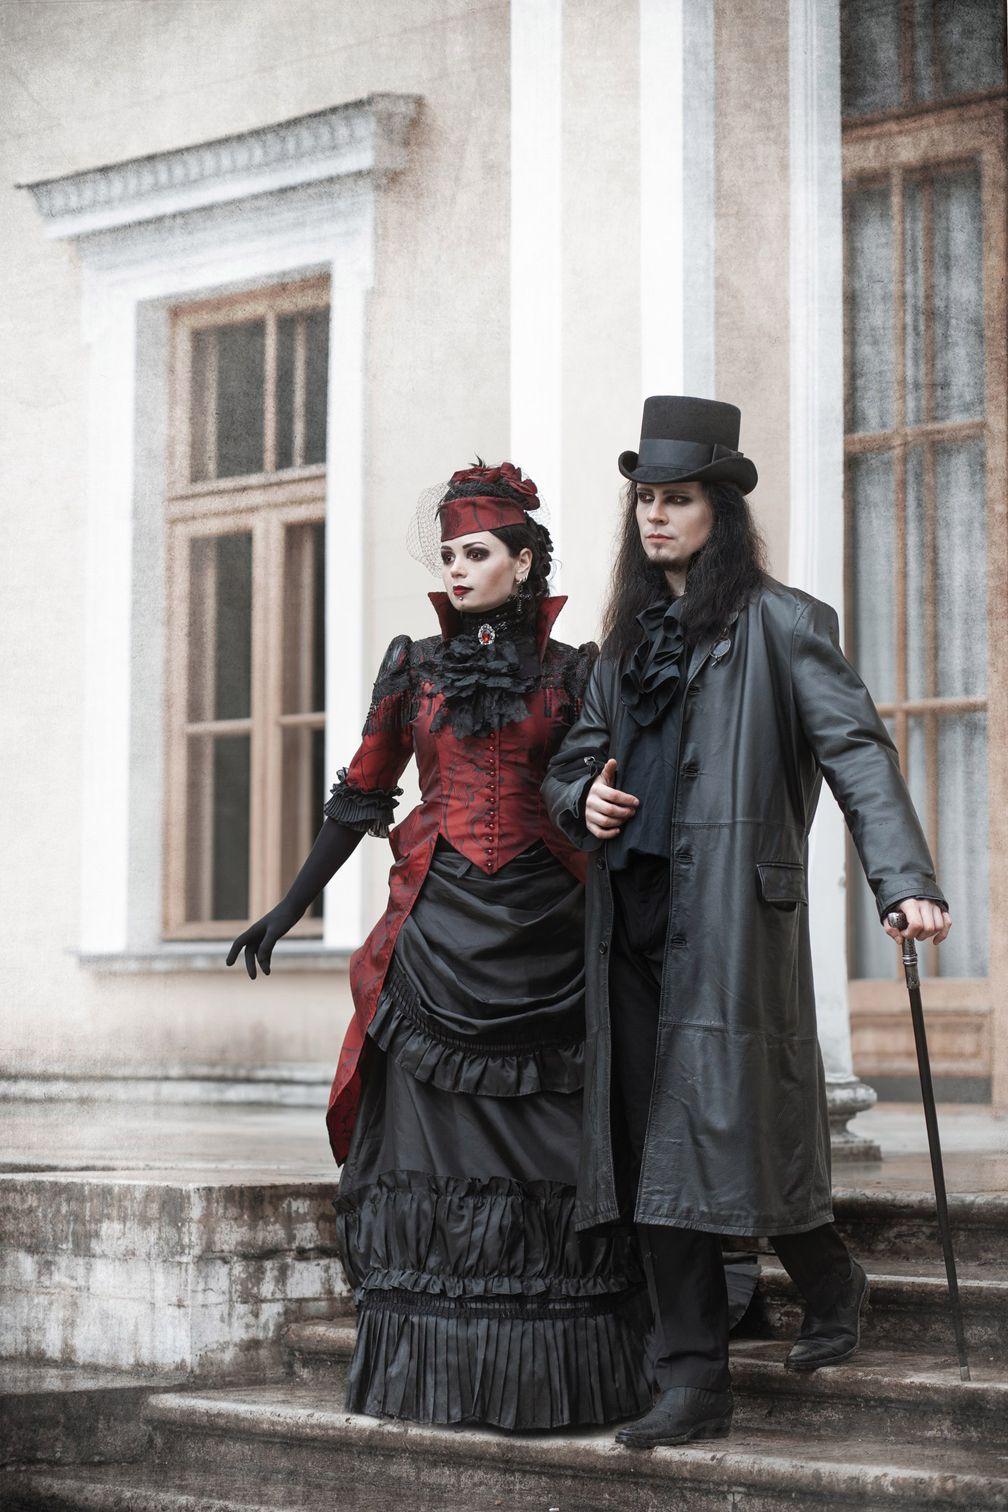 Red And Black Vampire Bustle Dress Ph Stanislav Aleksashin Md Katherine Baumgertner Andreas Kriger Mua Alina Cirki Vampirkleid Gothic Vampir Steampunk Mode